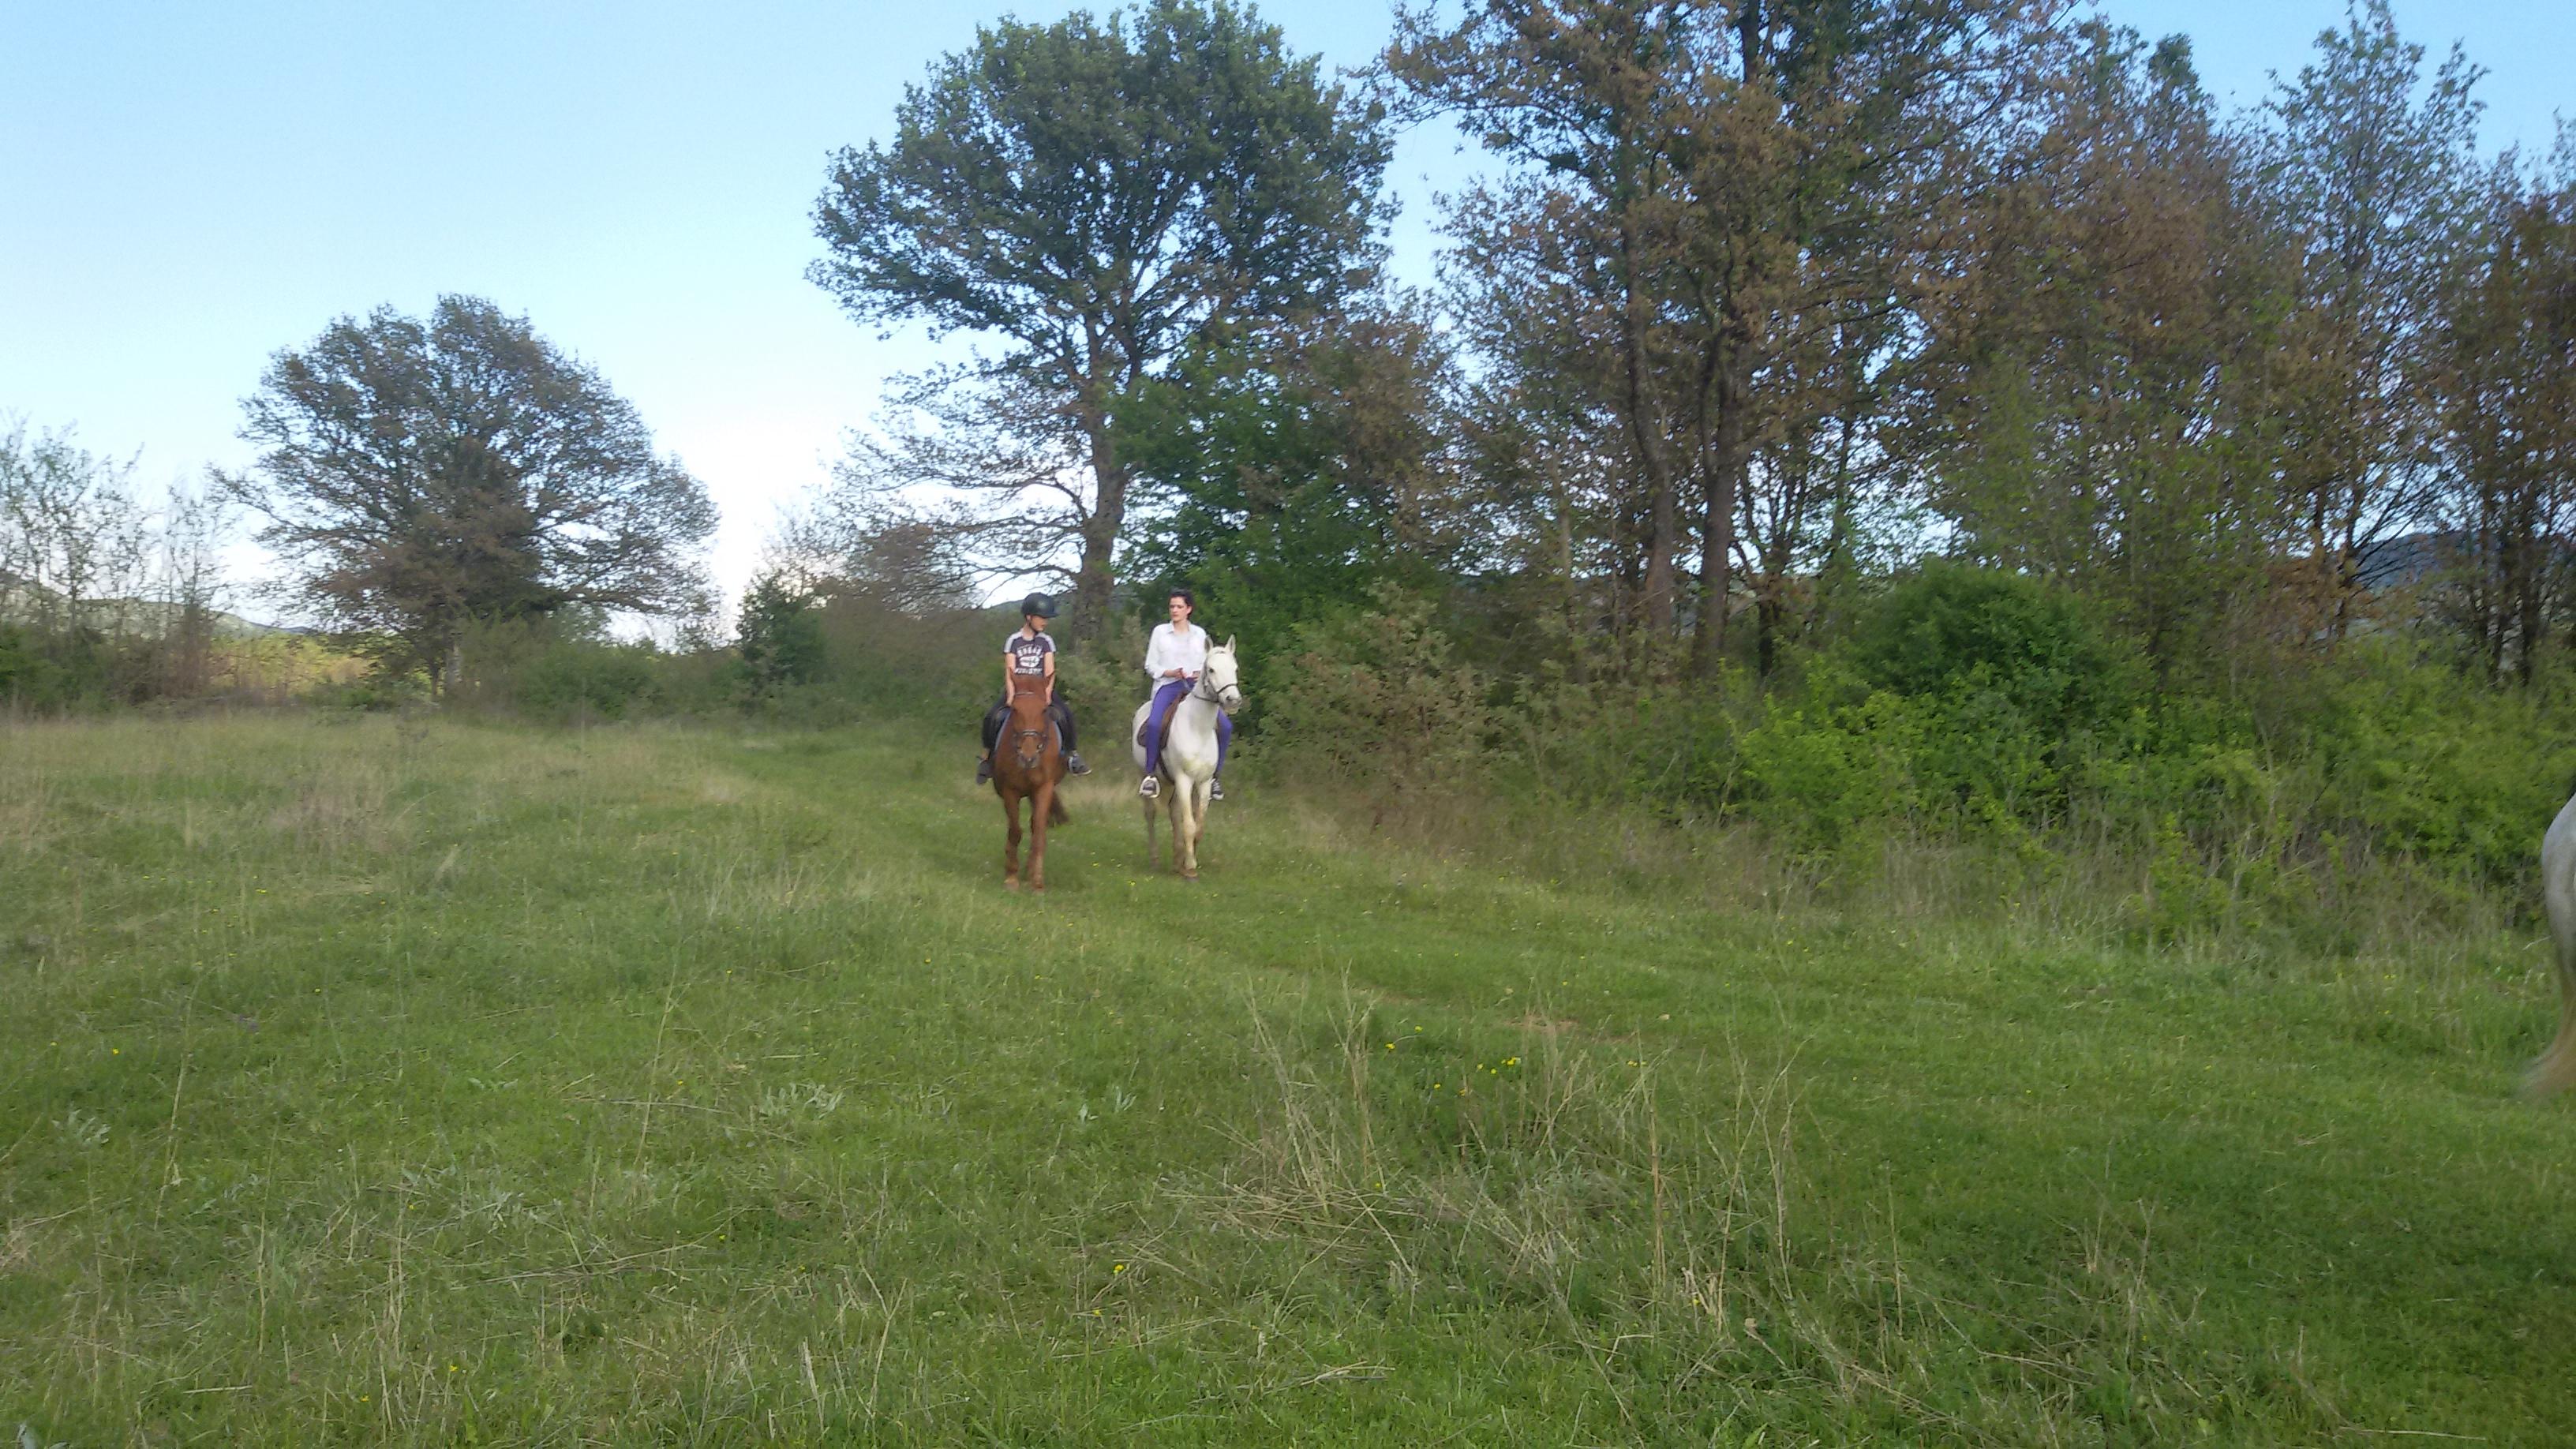 Vikend provedite na Blidinju gdje vas očekuje i mogućnost jahanja konja